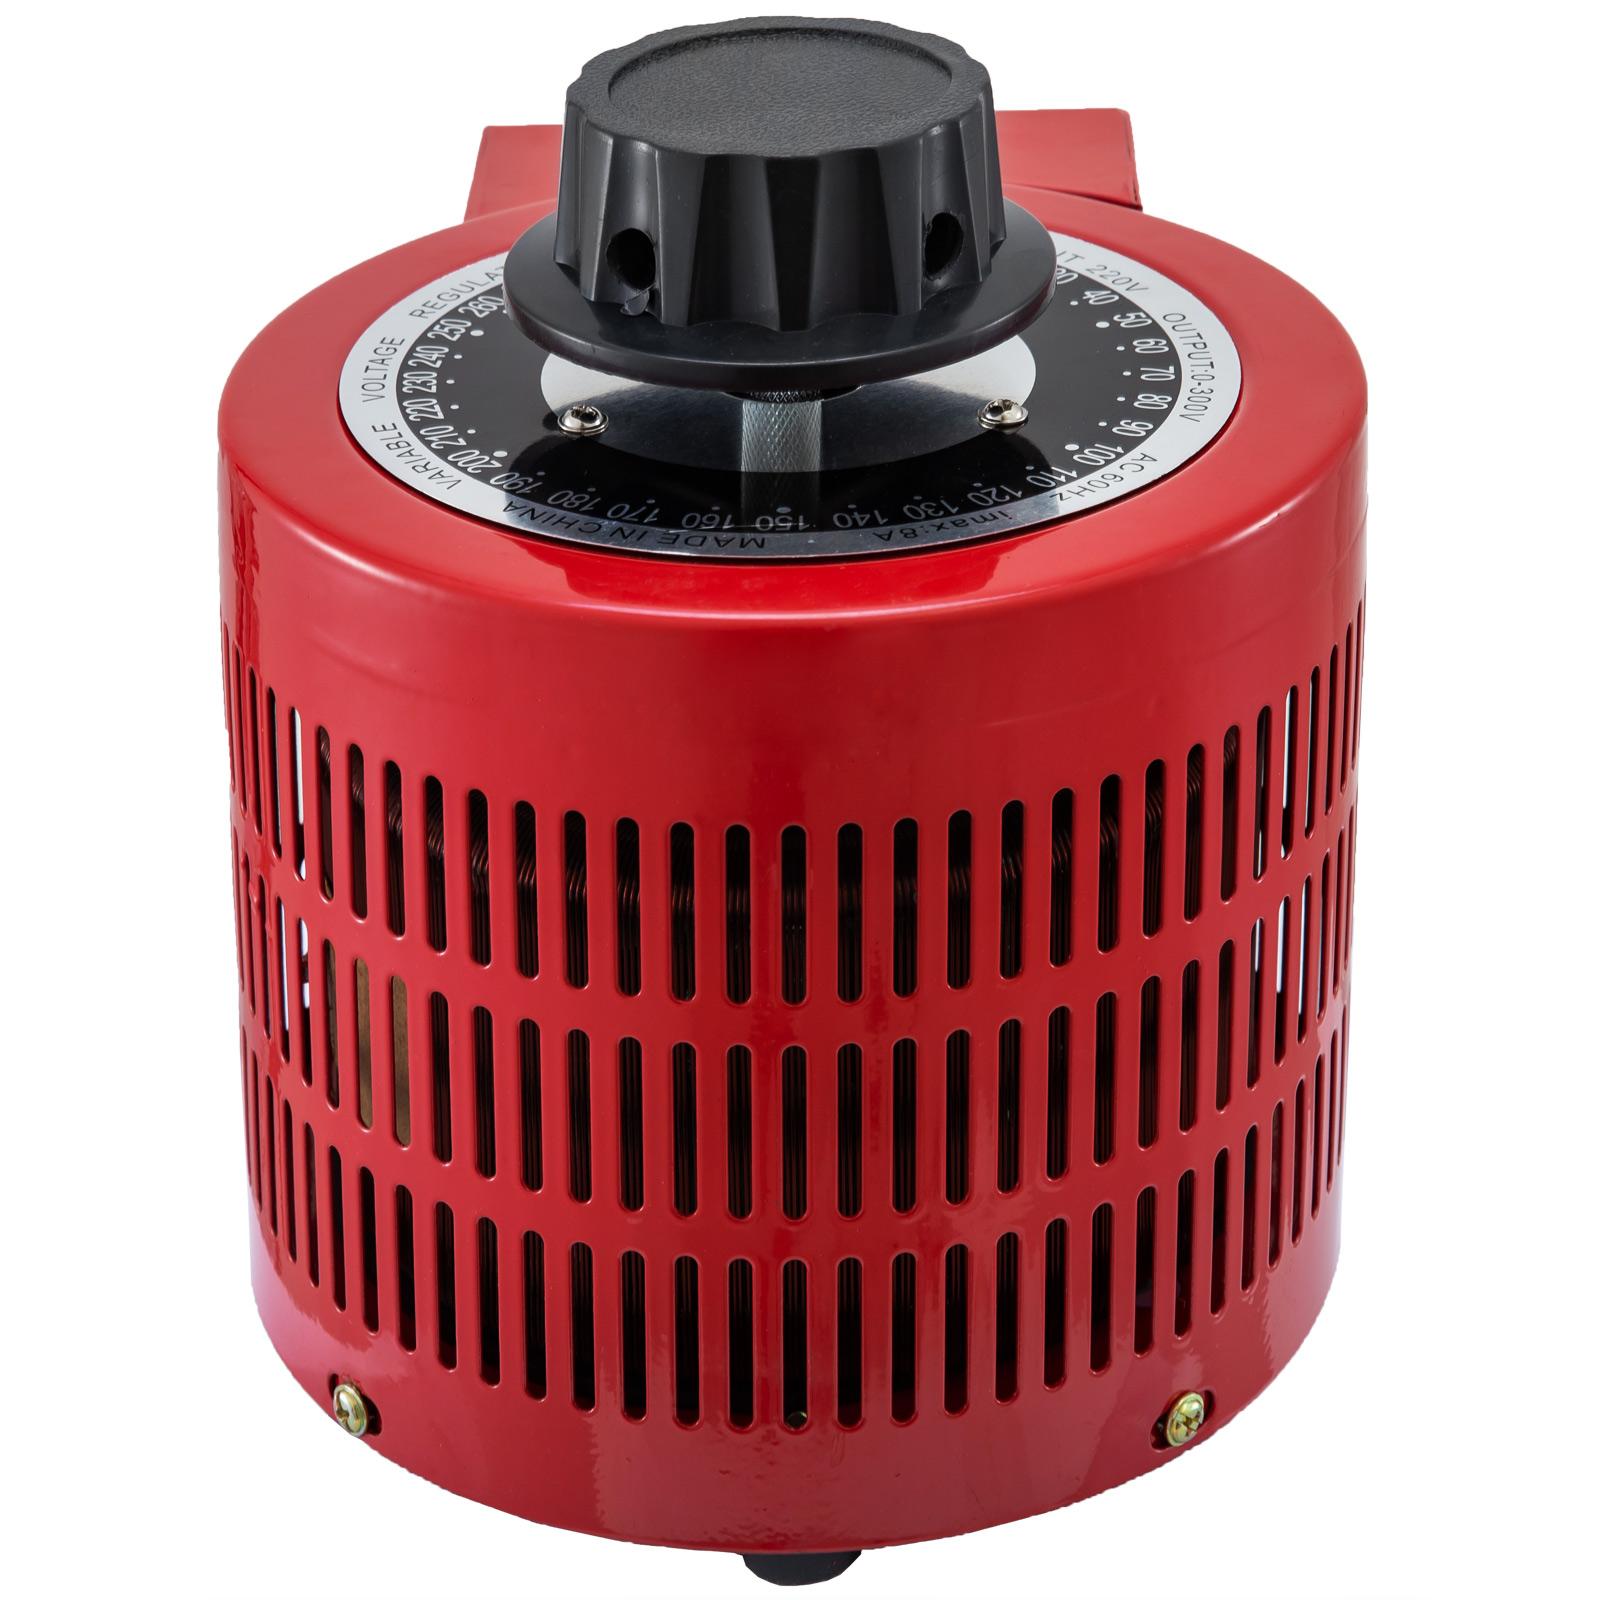 Auto-Variac-Variable-Transformer-0-5-1-2-3KVA-Regulator-pure-copper-coil-220V thumbnail 59